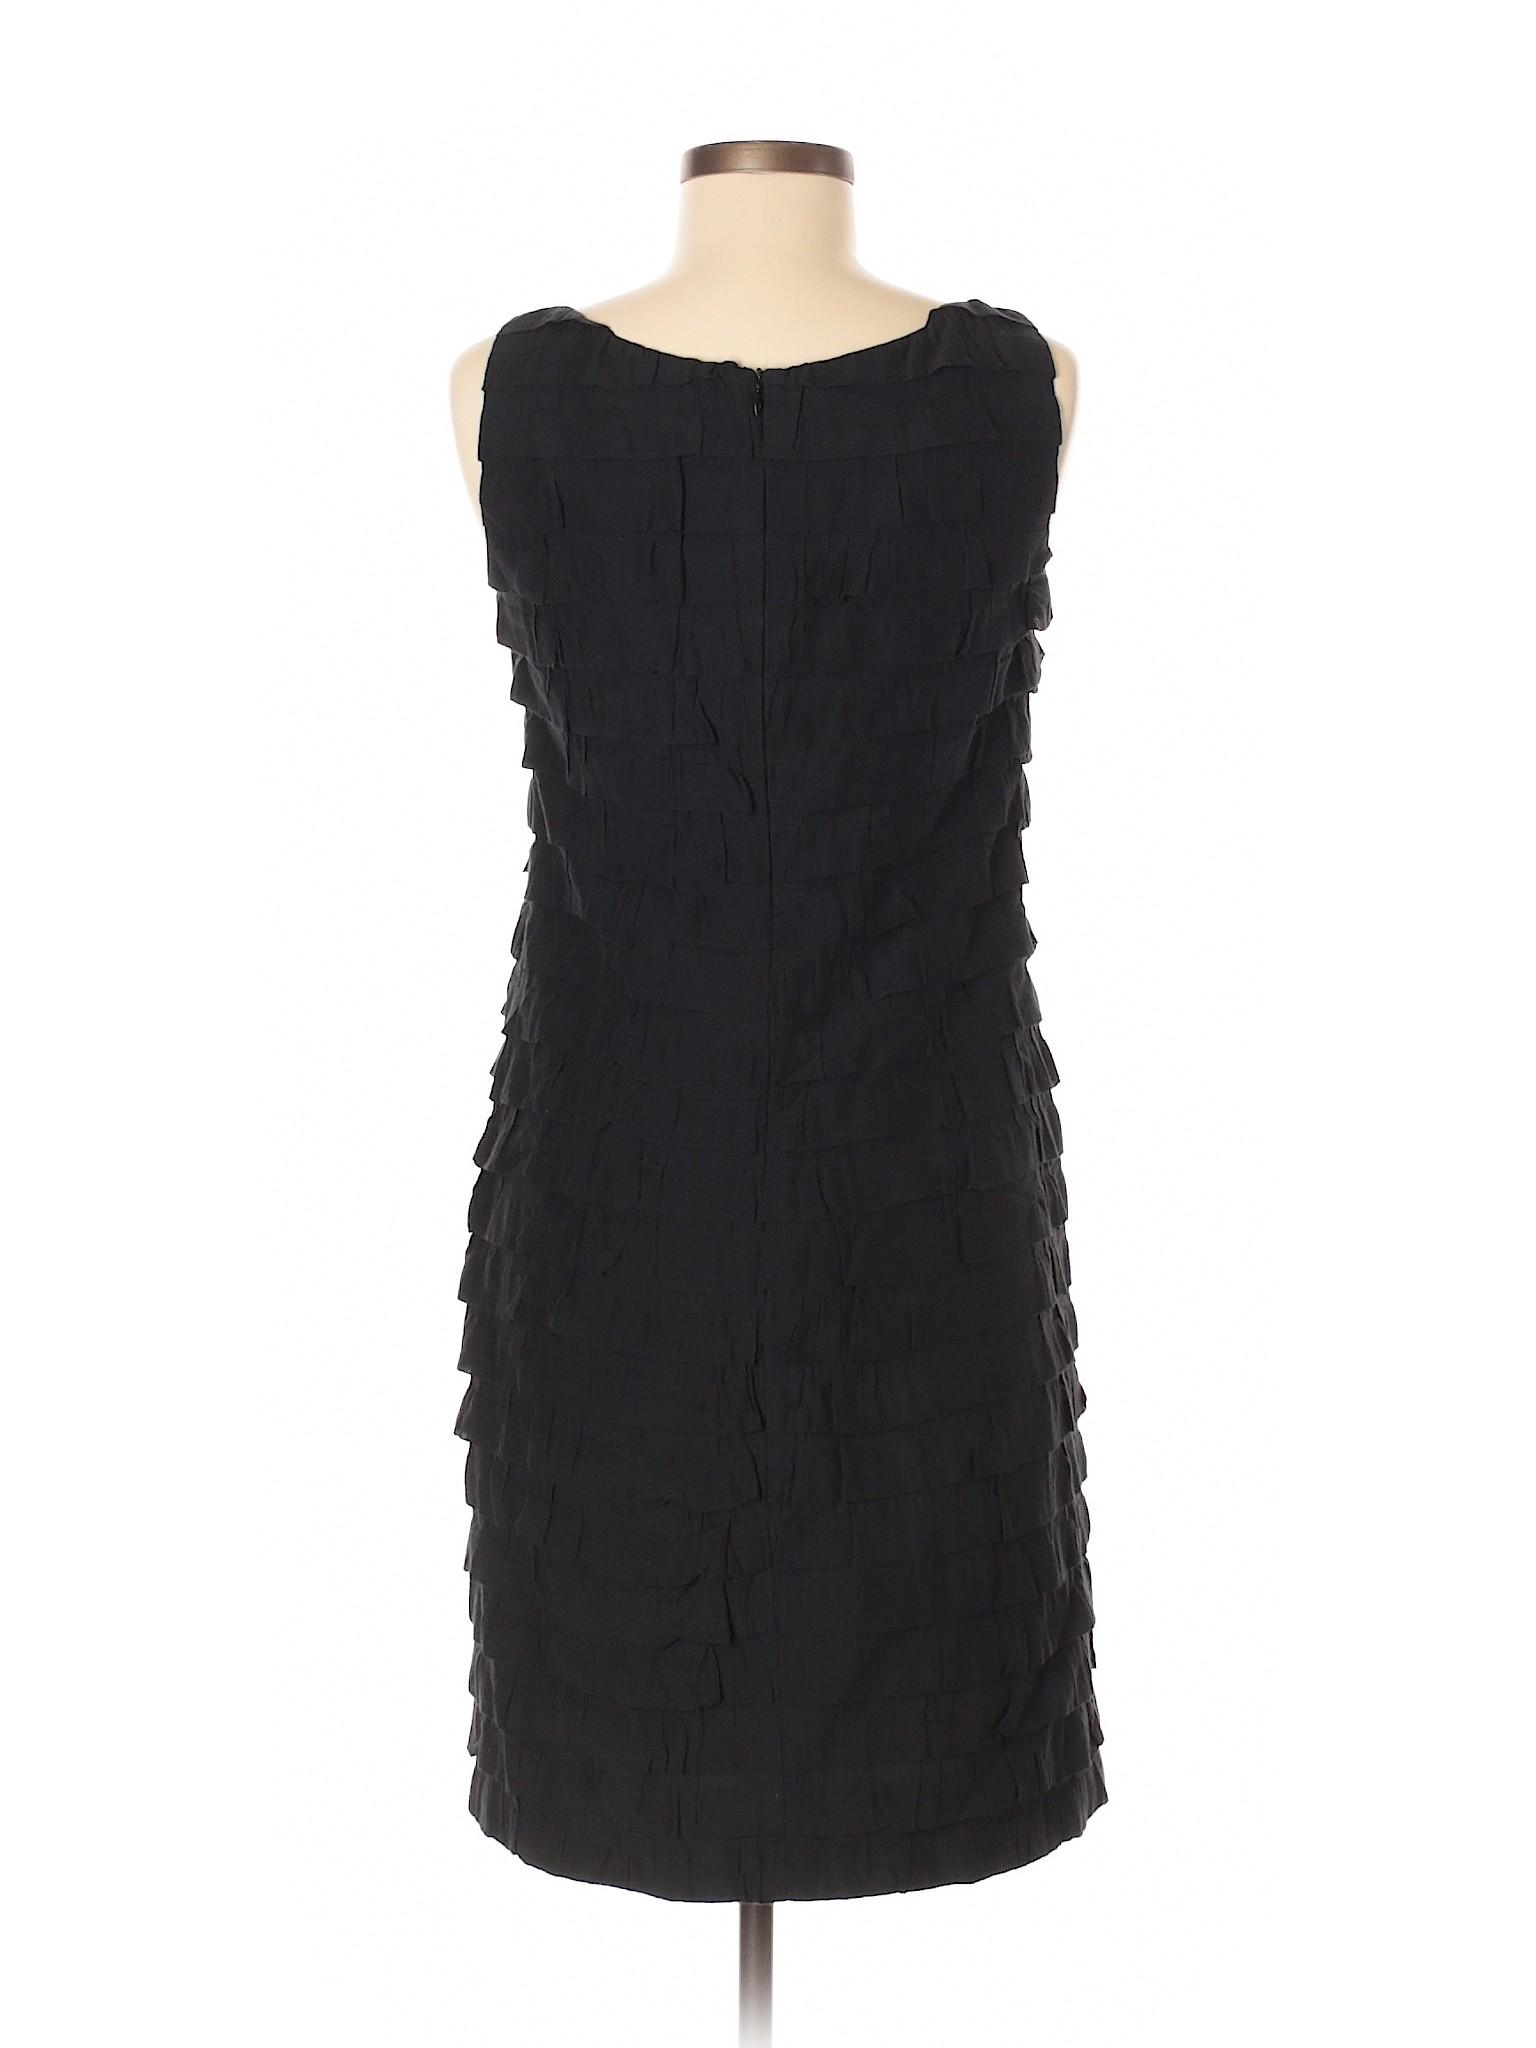 Selling Piazza Dress Casual Sempione Selling Piazza nwq5Cx8HOE